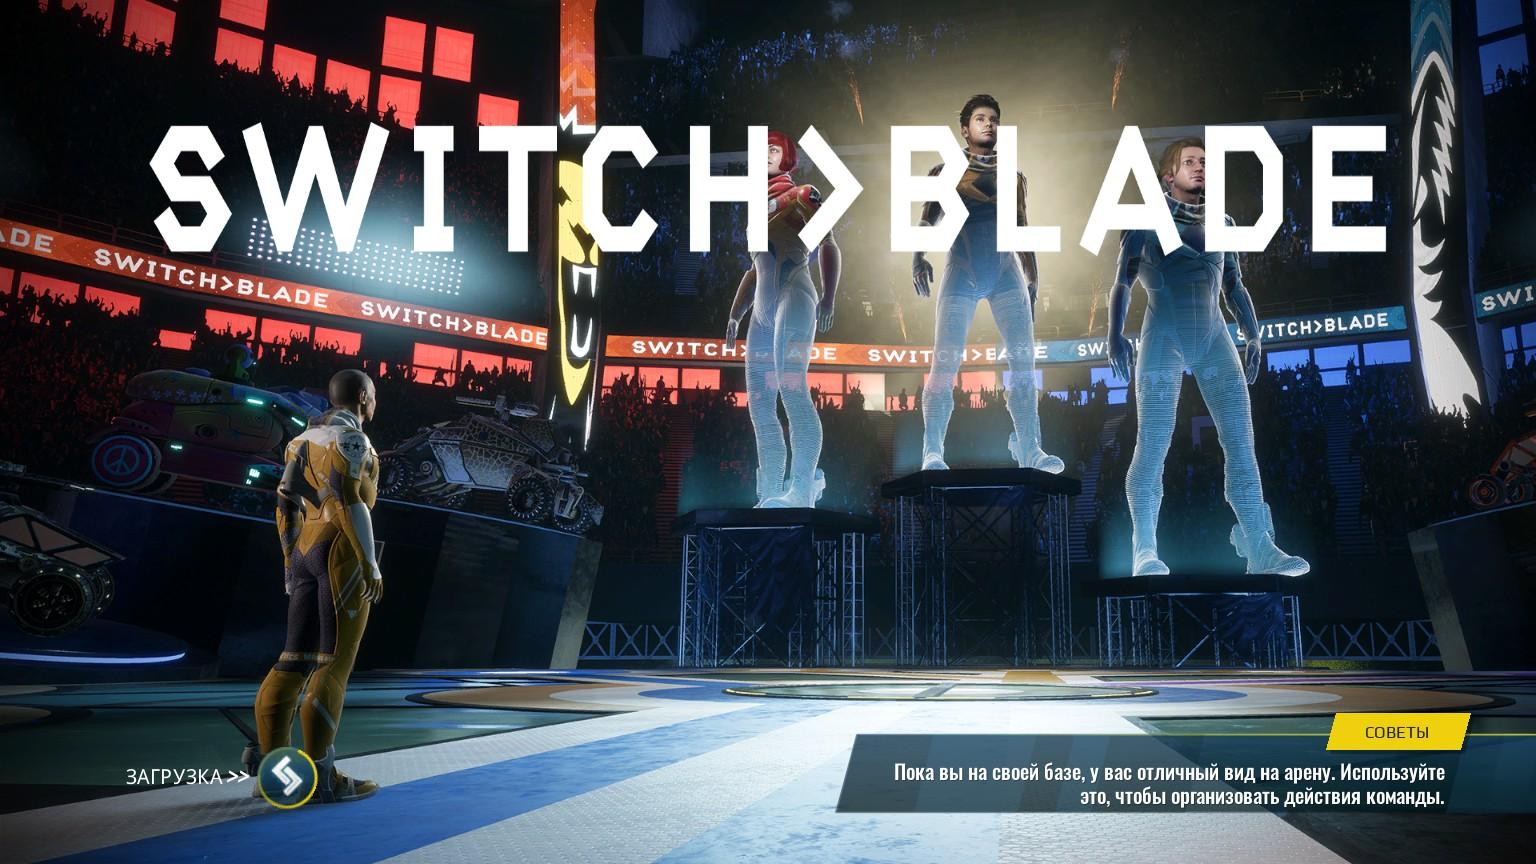 Switchblade…